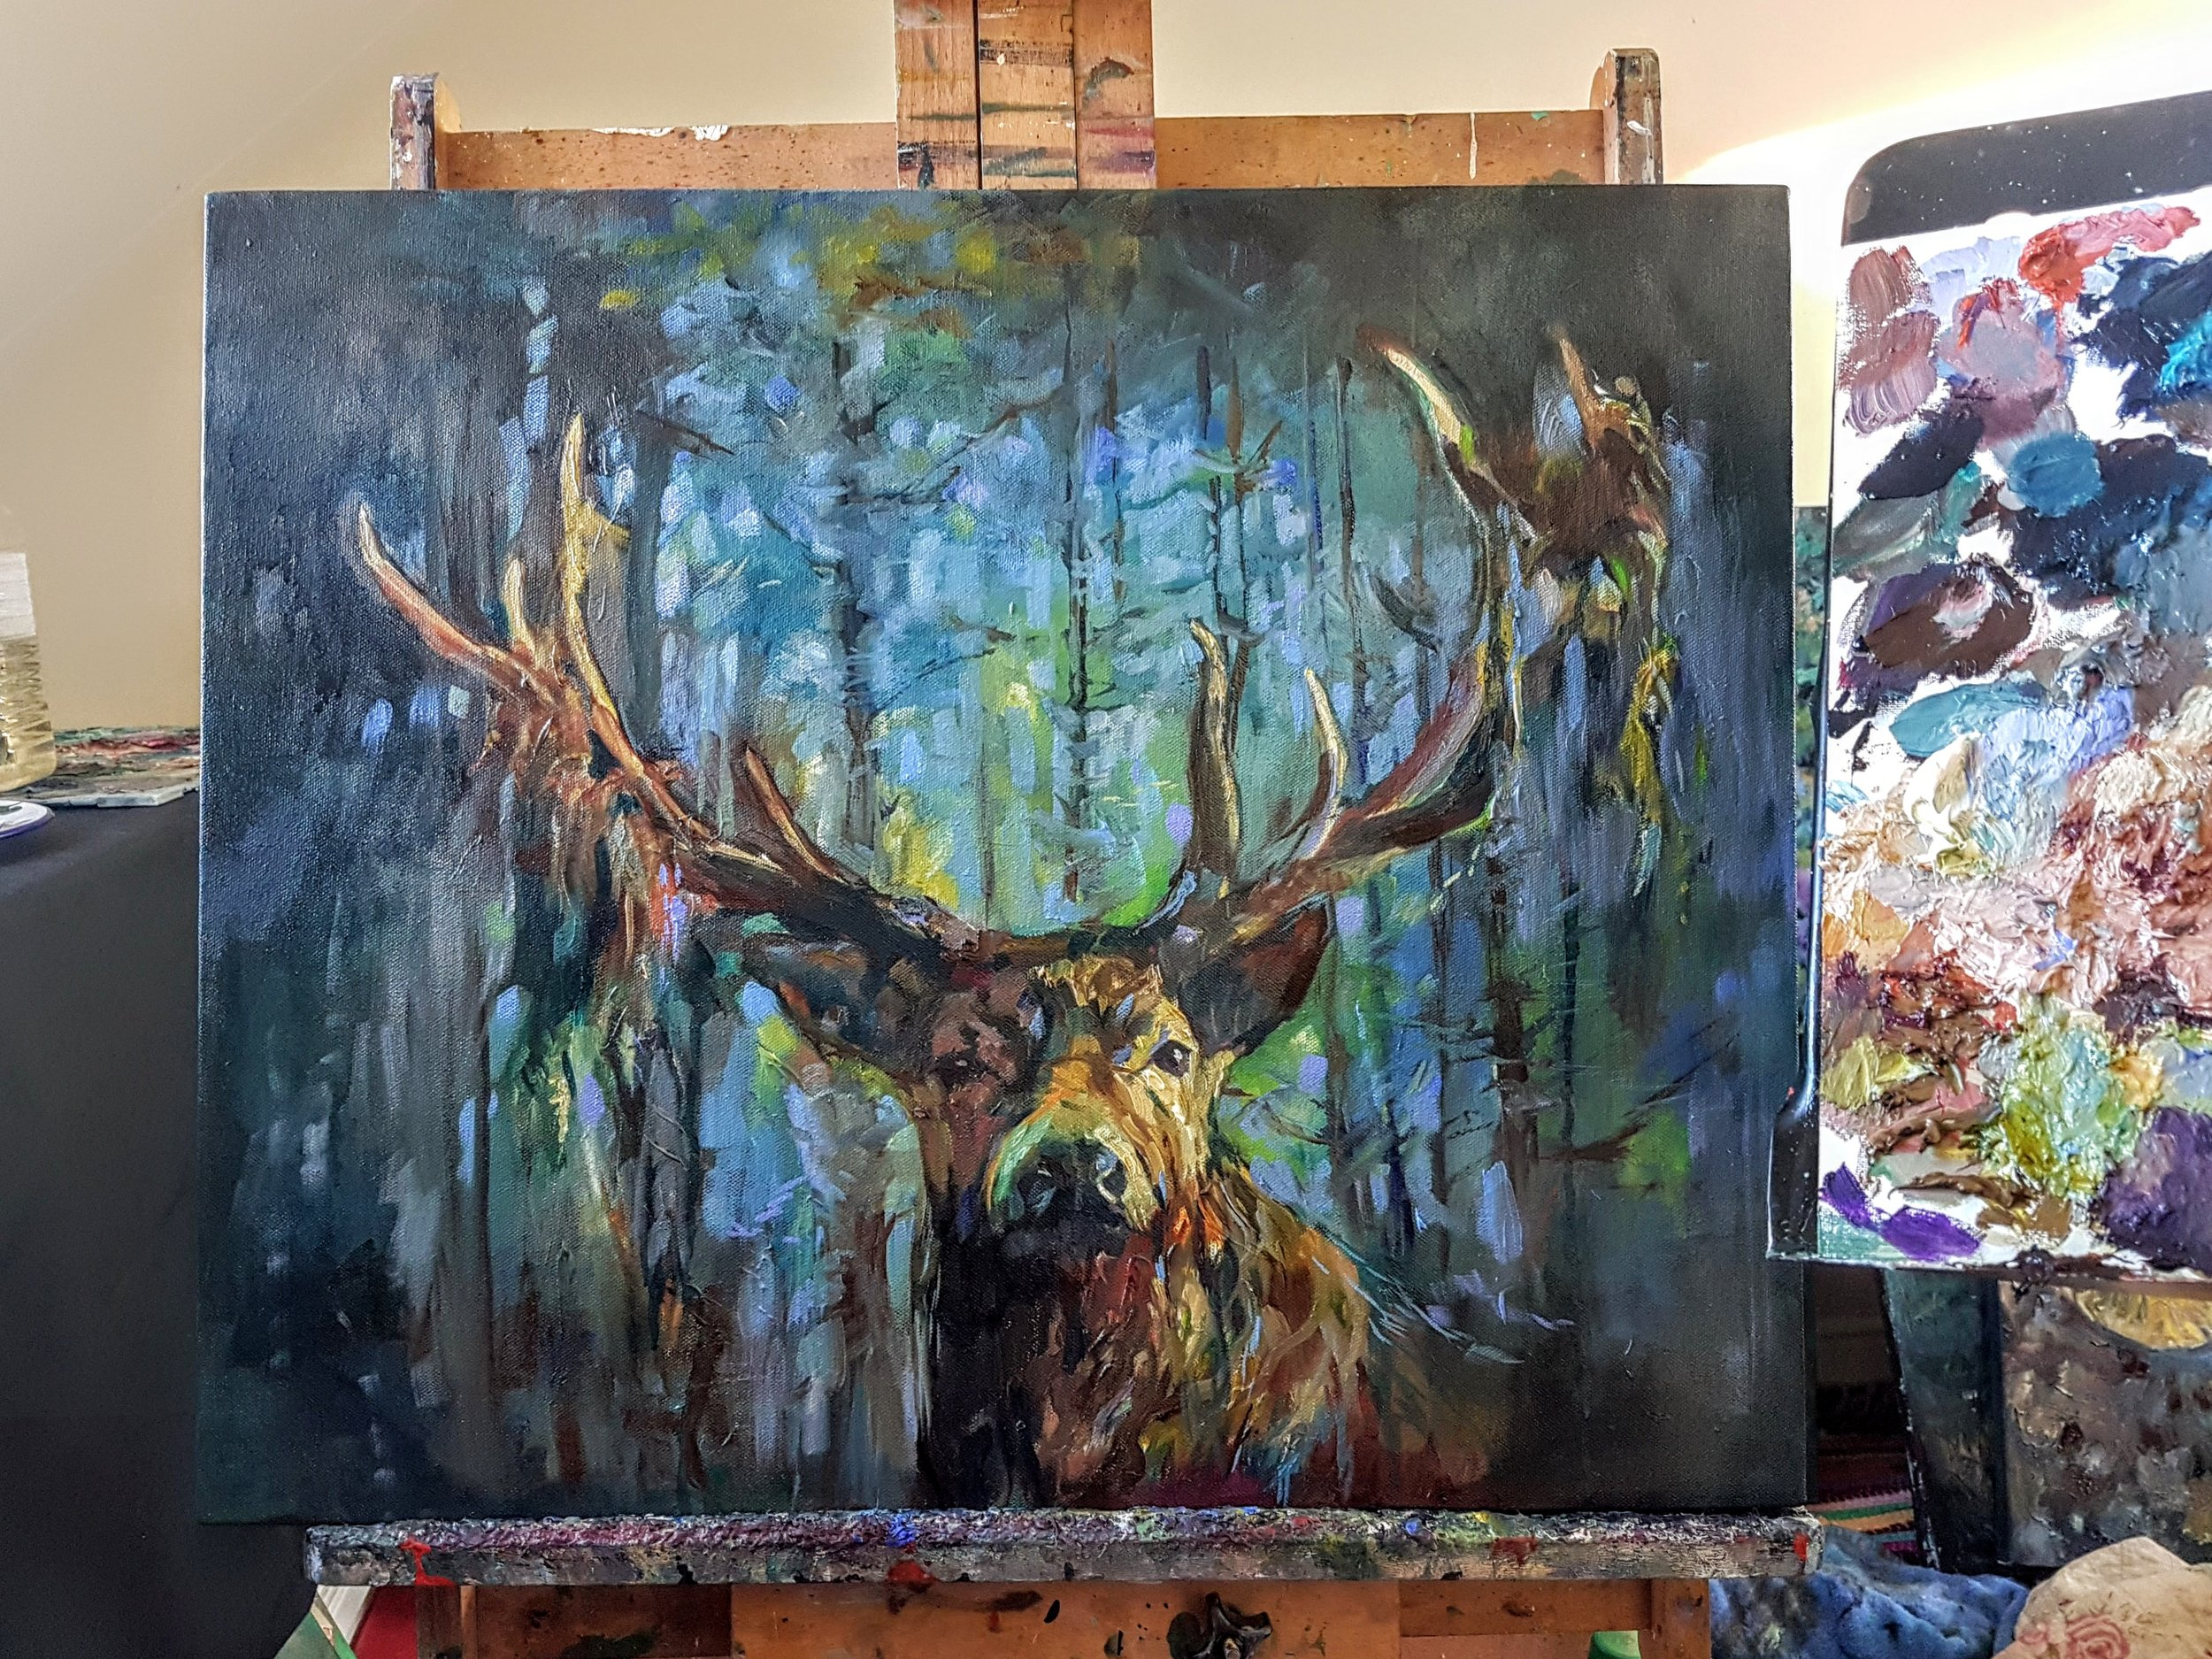 stag painting uk sue gardner canvas in progress